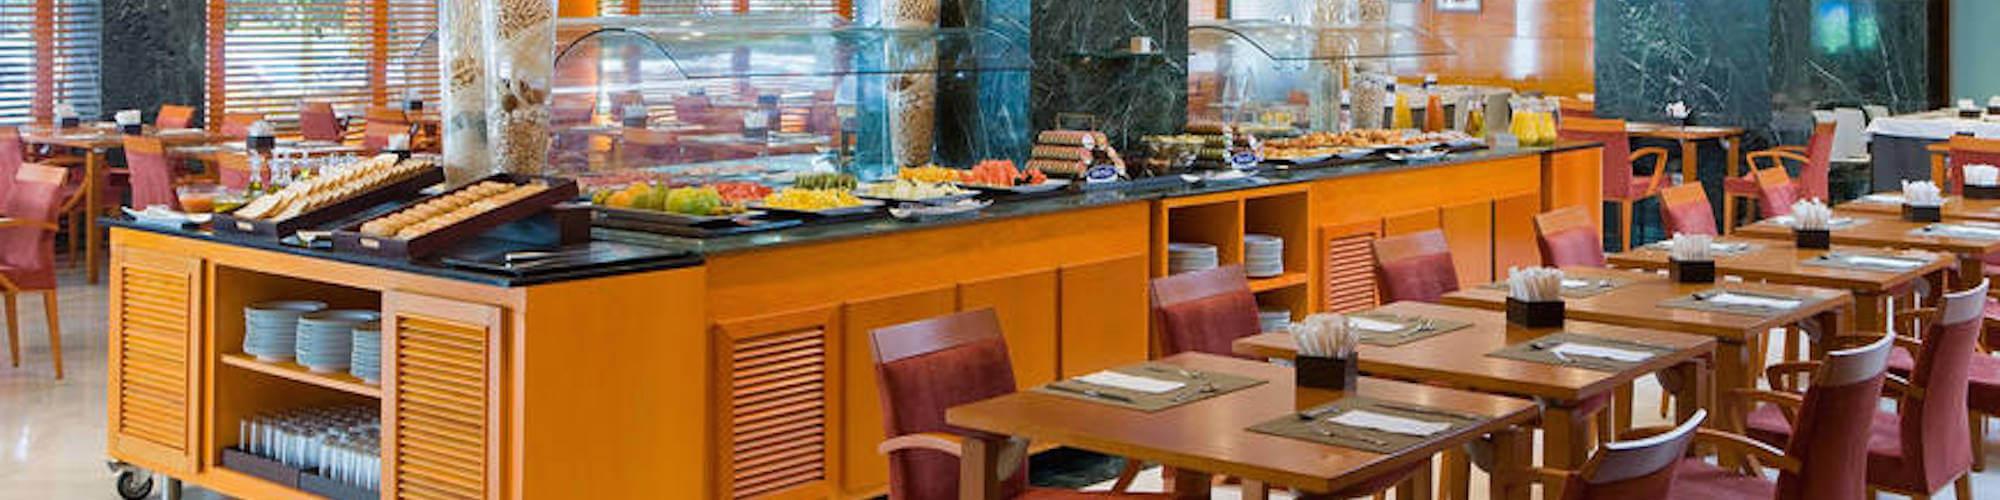 Hotel Amistad Murcia